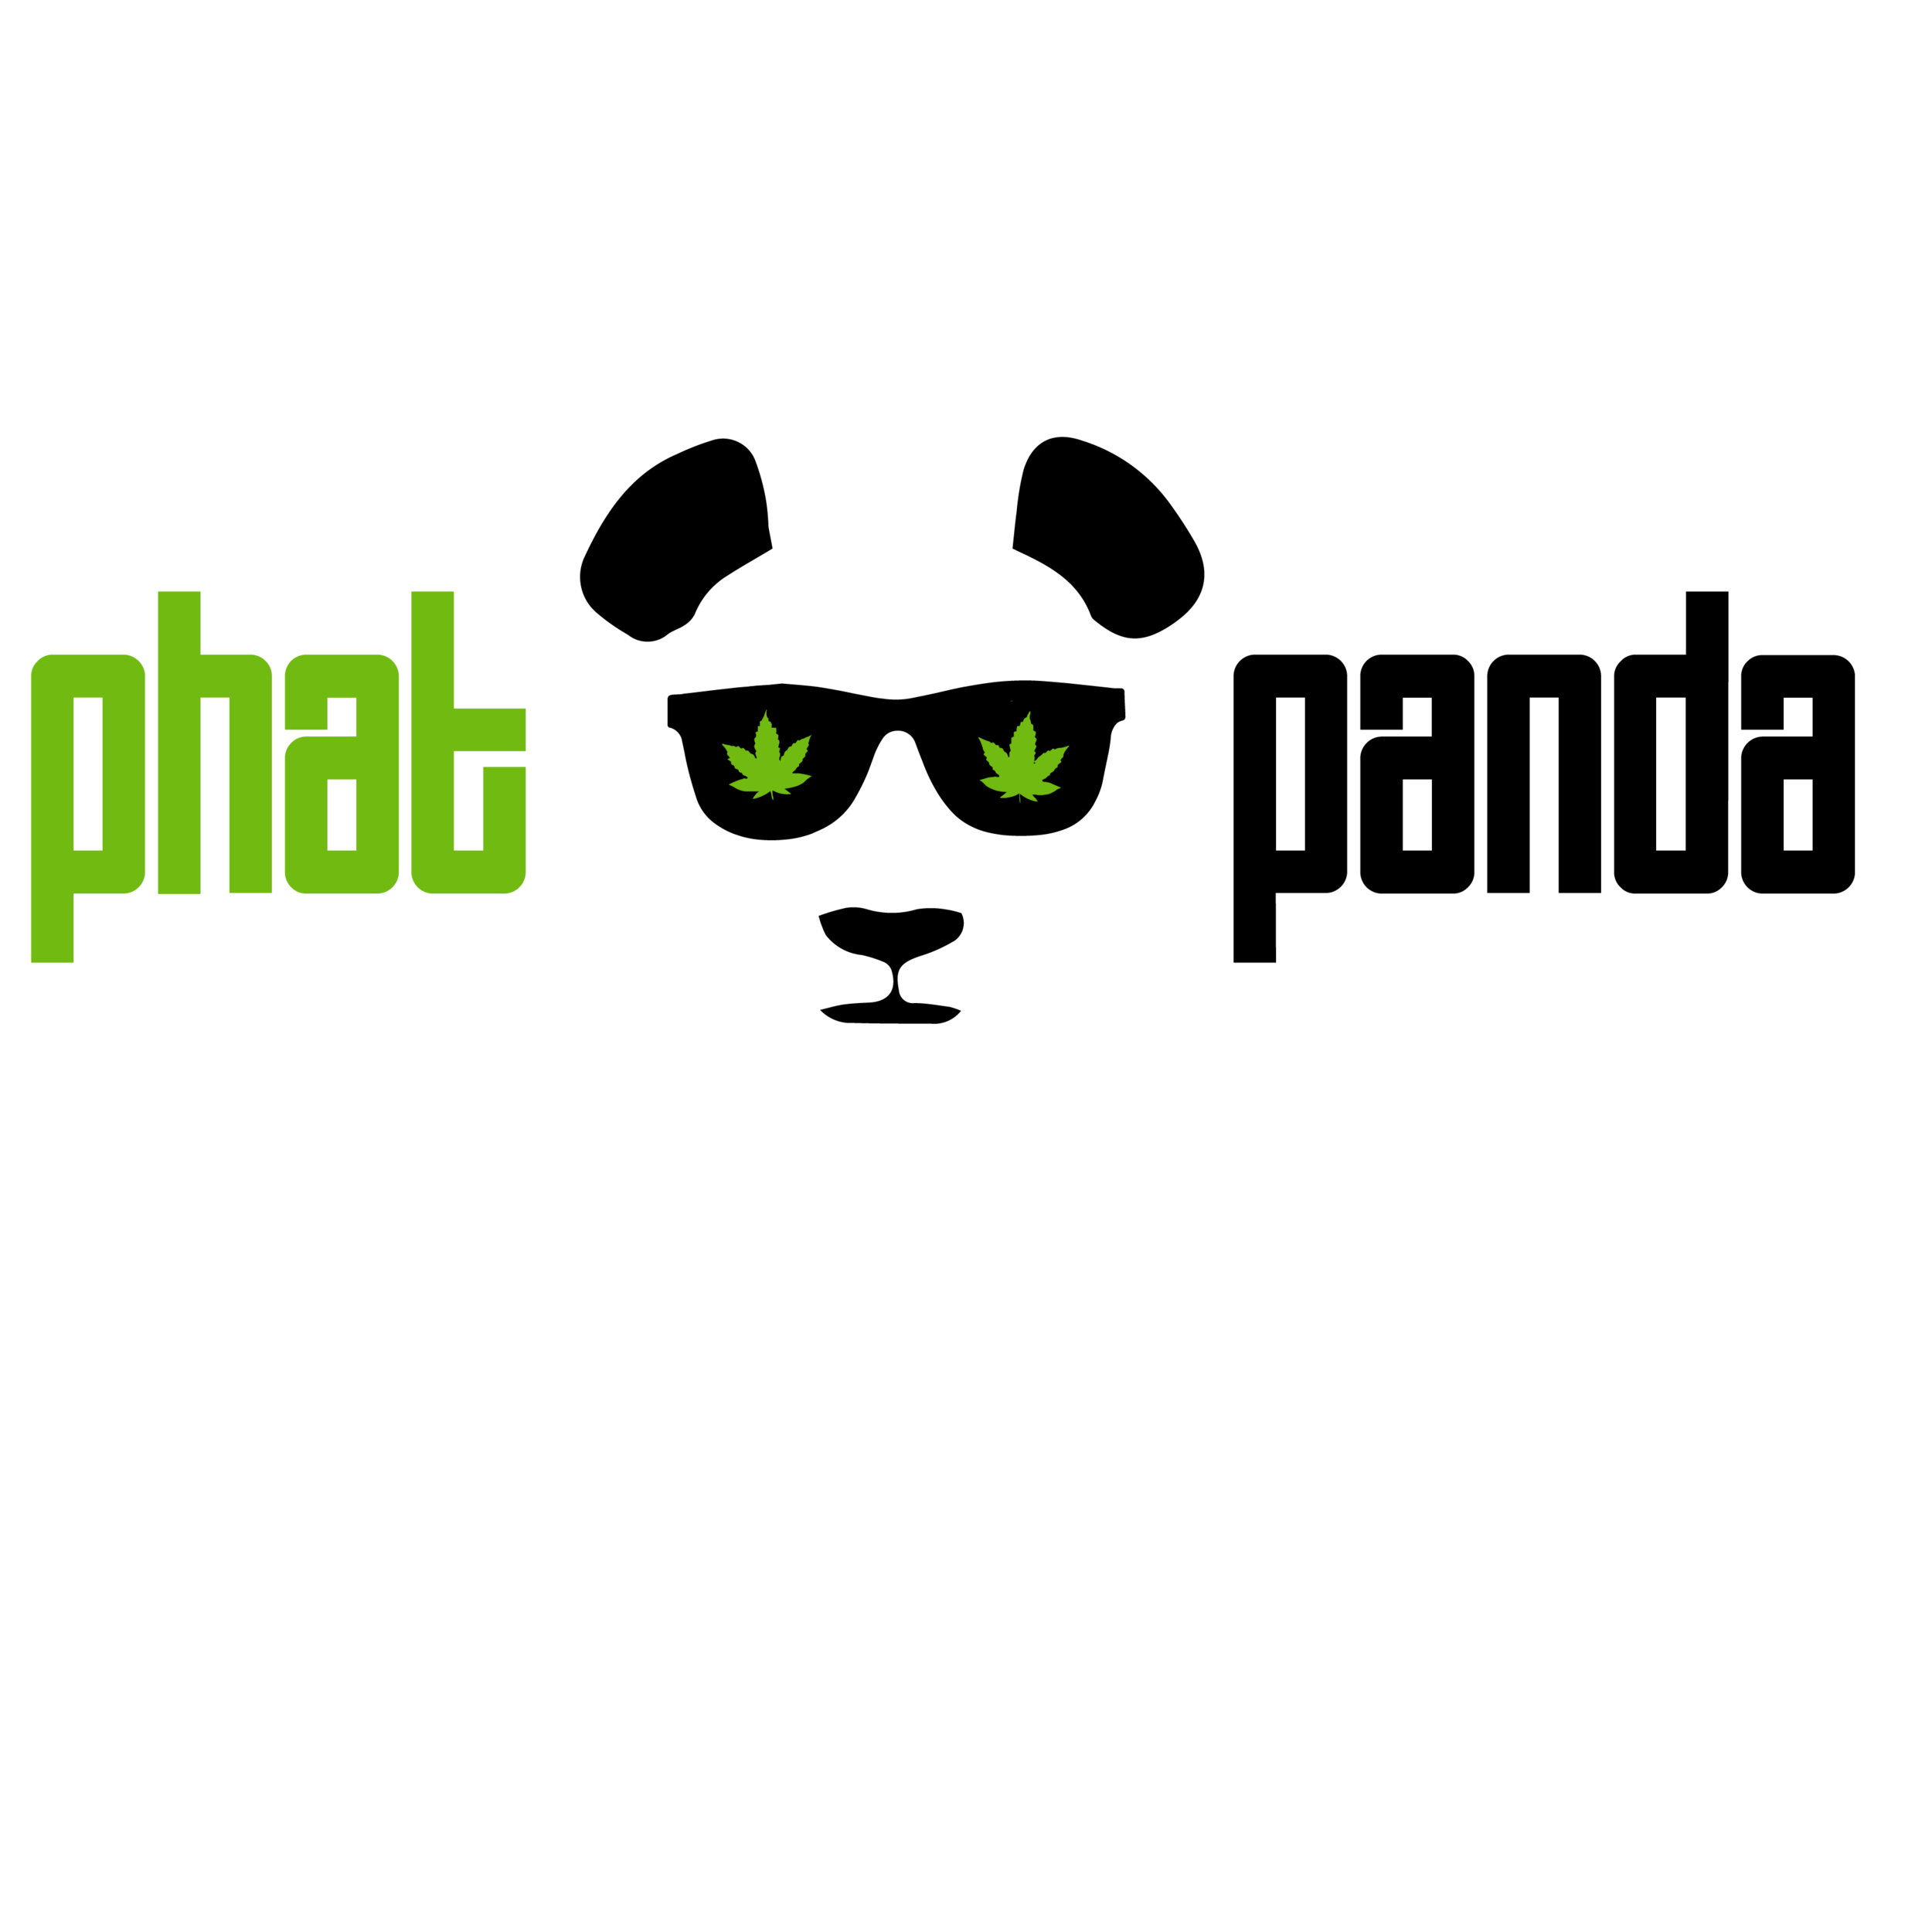 PhatP-01.png